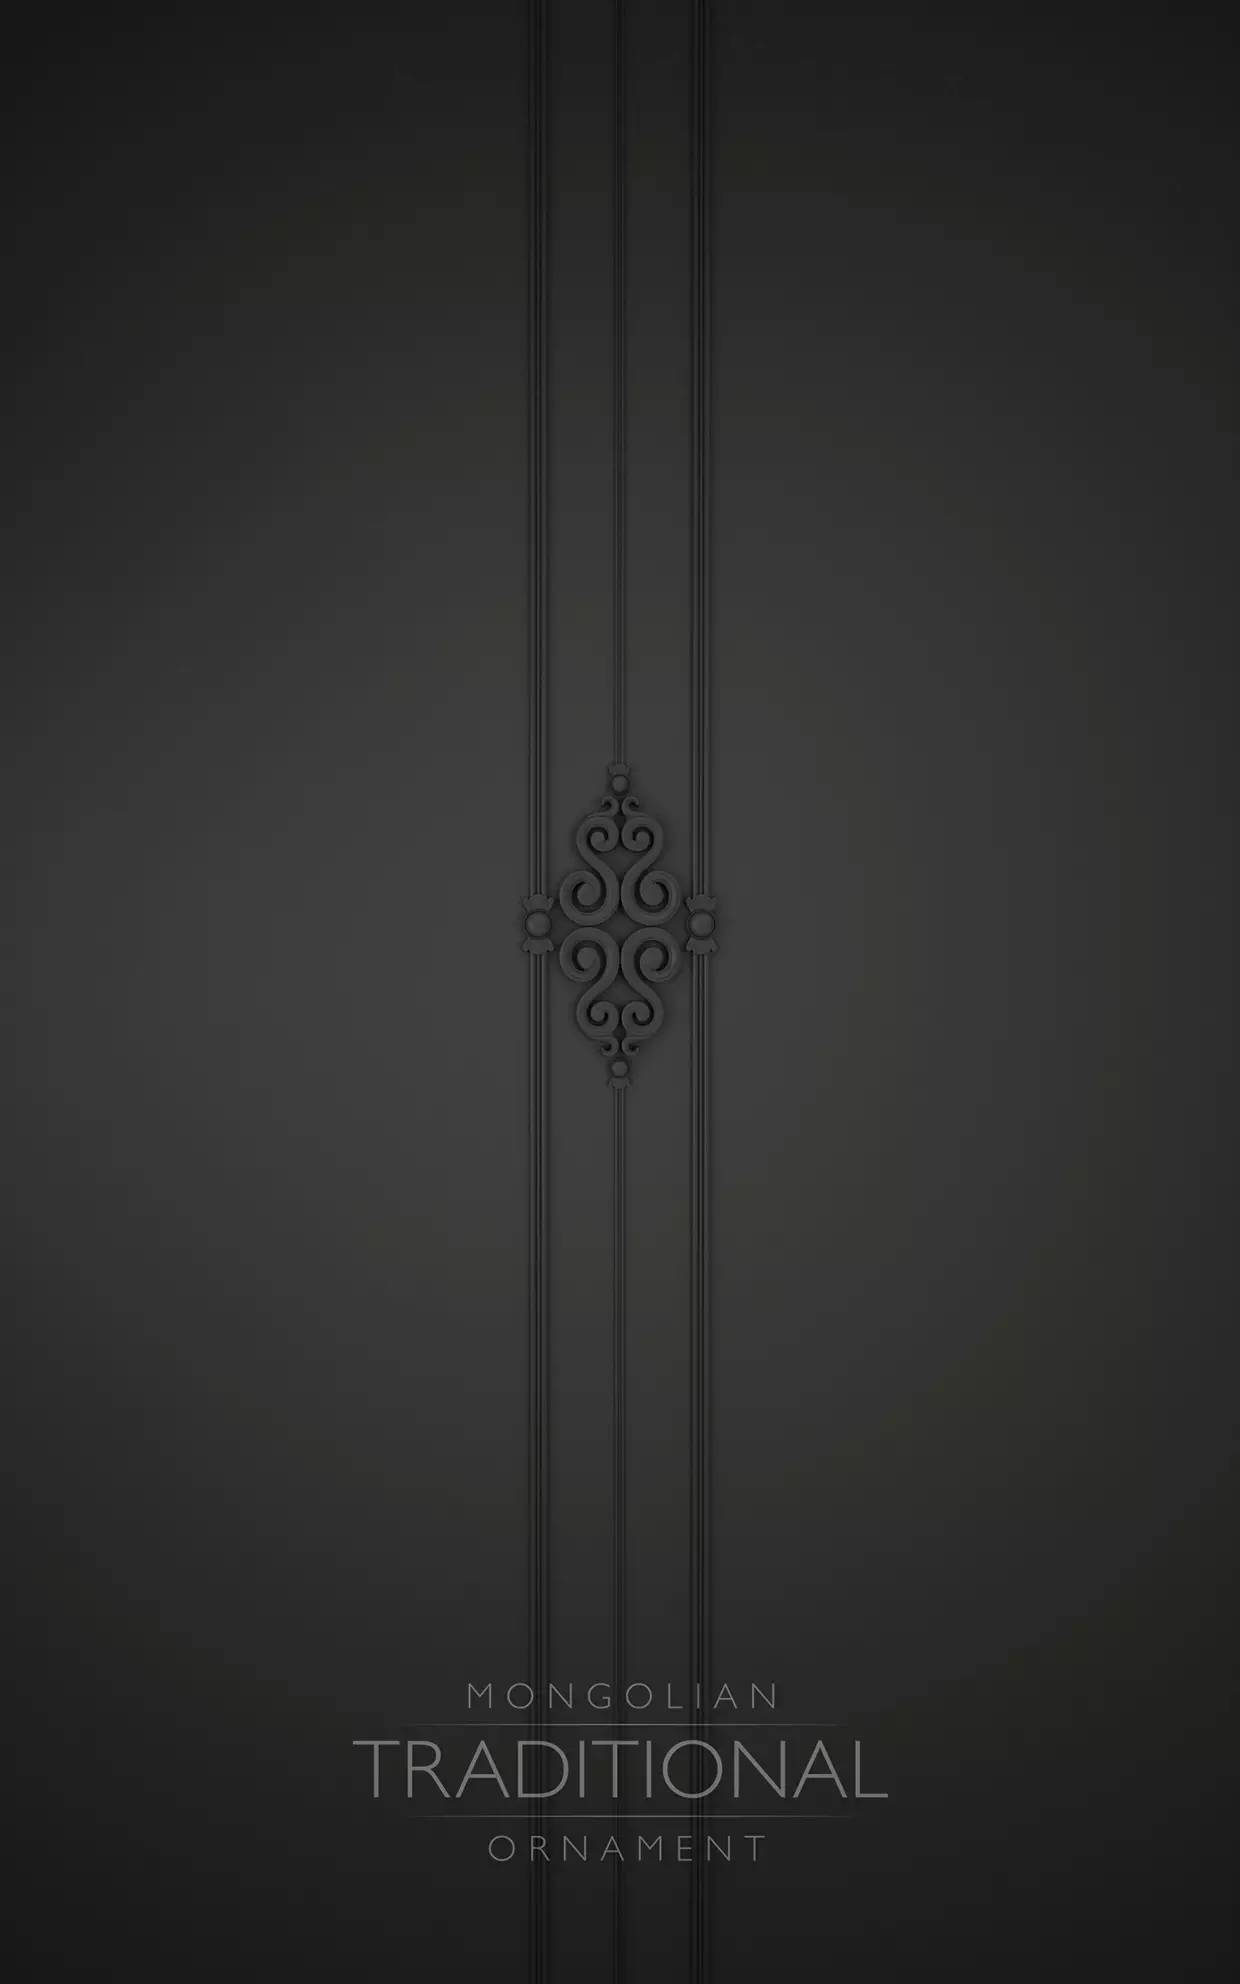 室内设计 蒙族传统装饰(Mongolian Traditional Ornament) 第7张